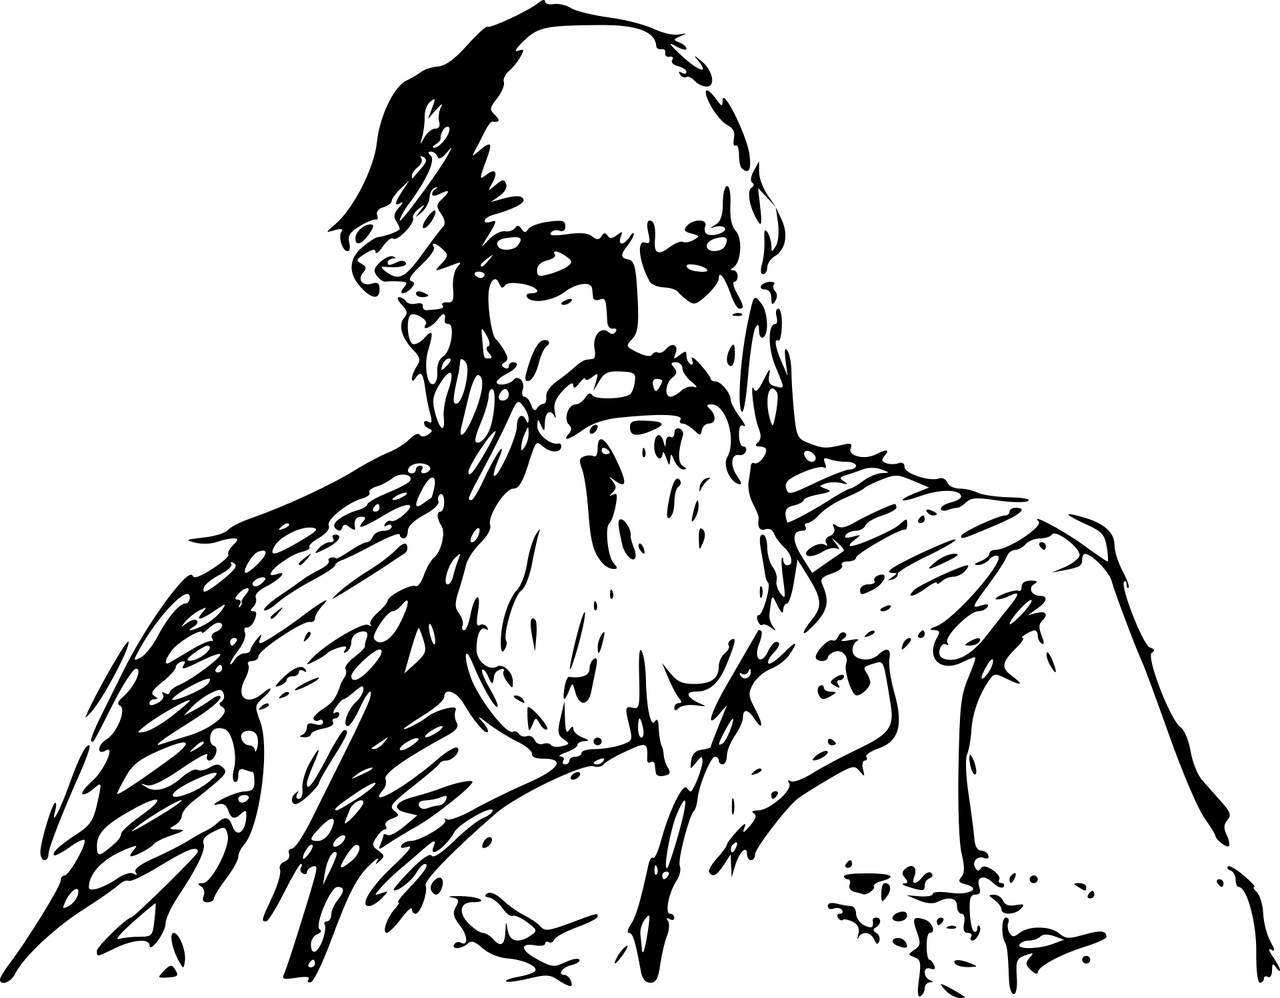 charles darwin, evolution, famous people